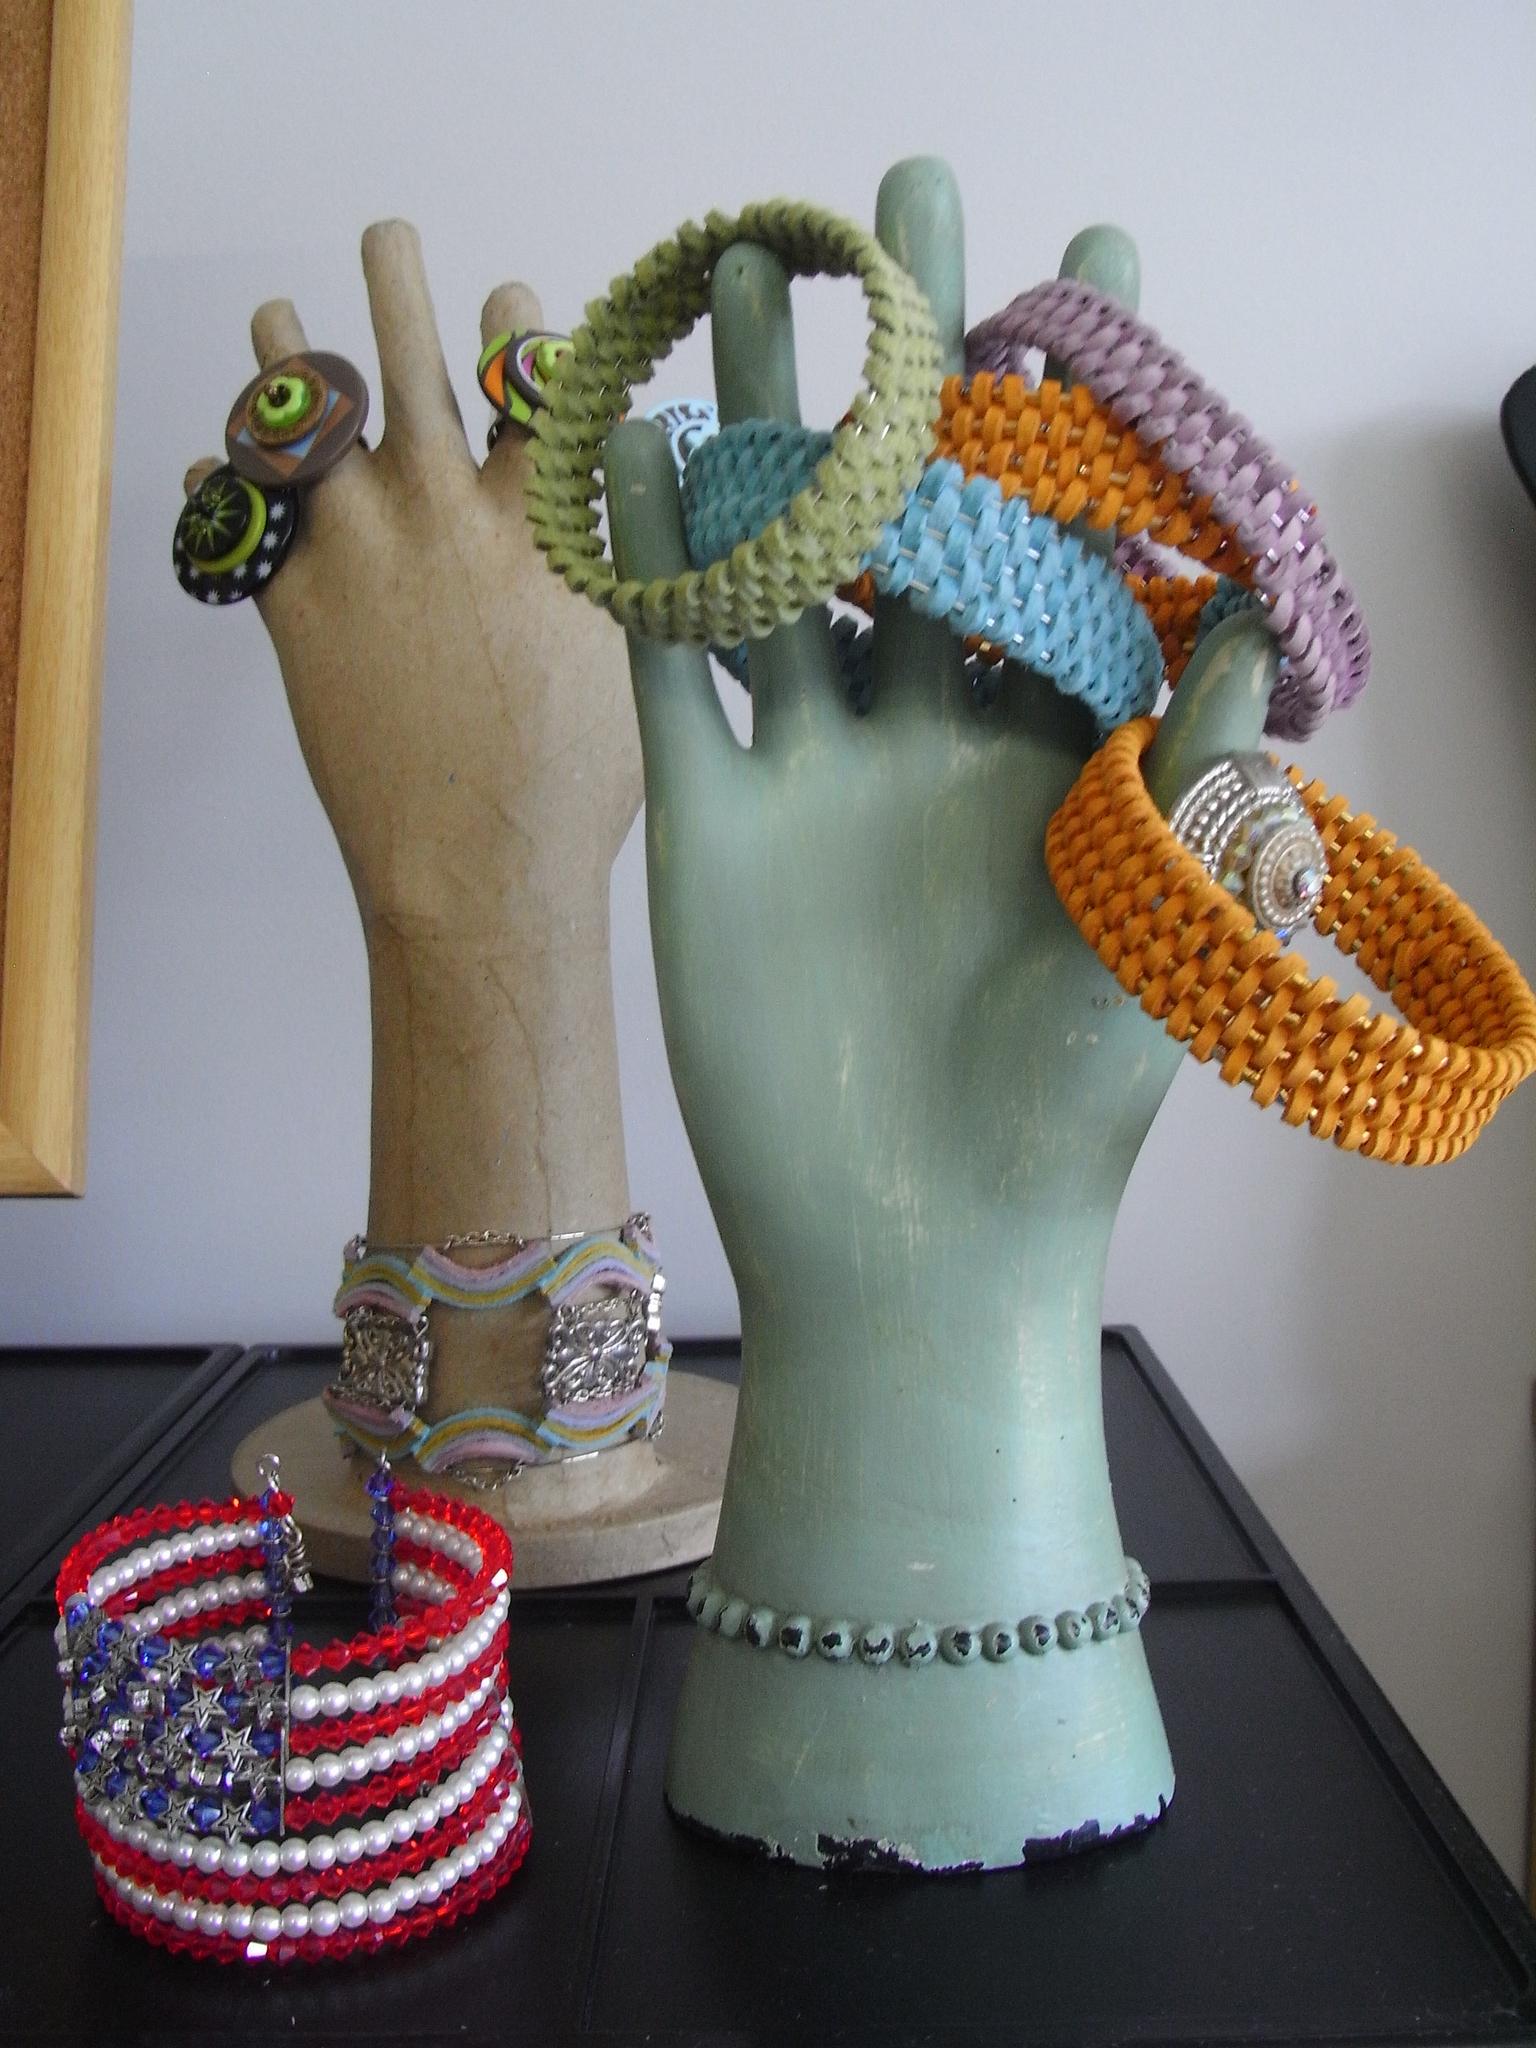 119 2f2015 04 18 060409 wovenleather bracelets